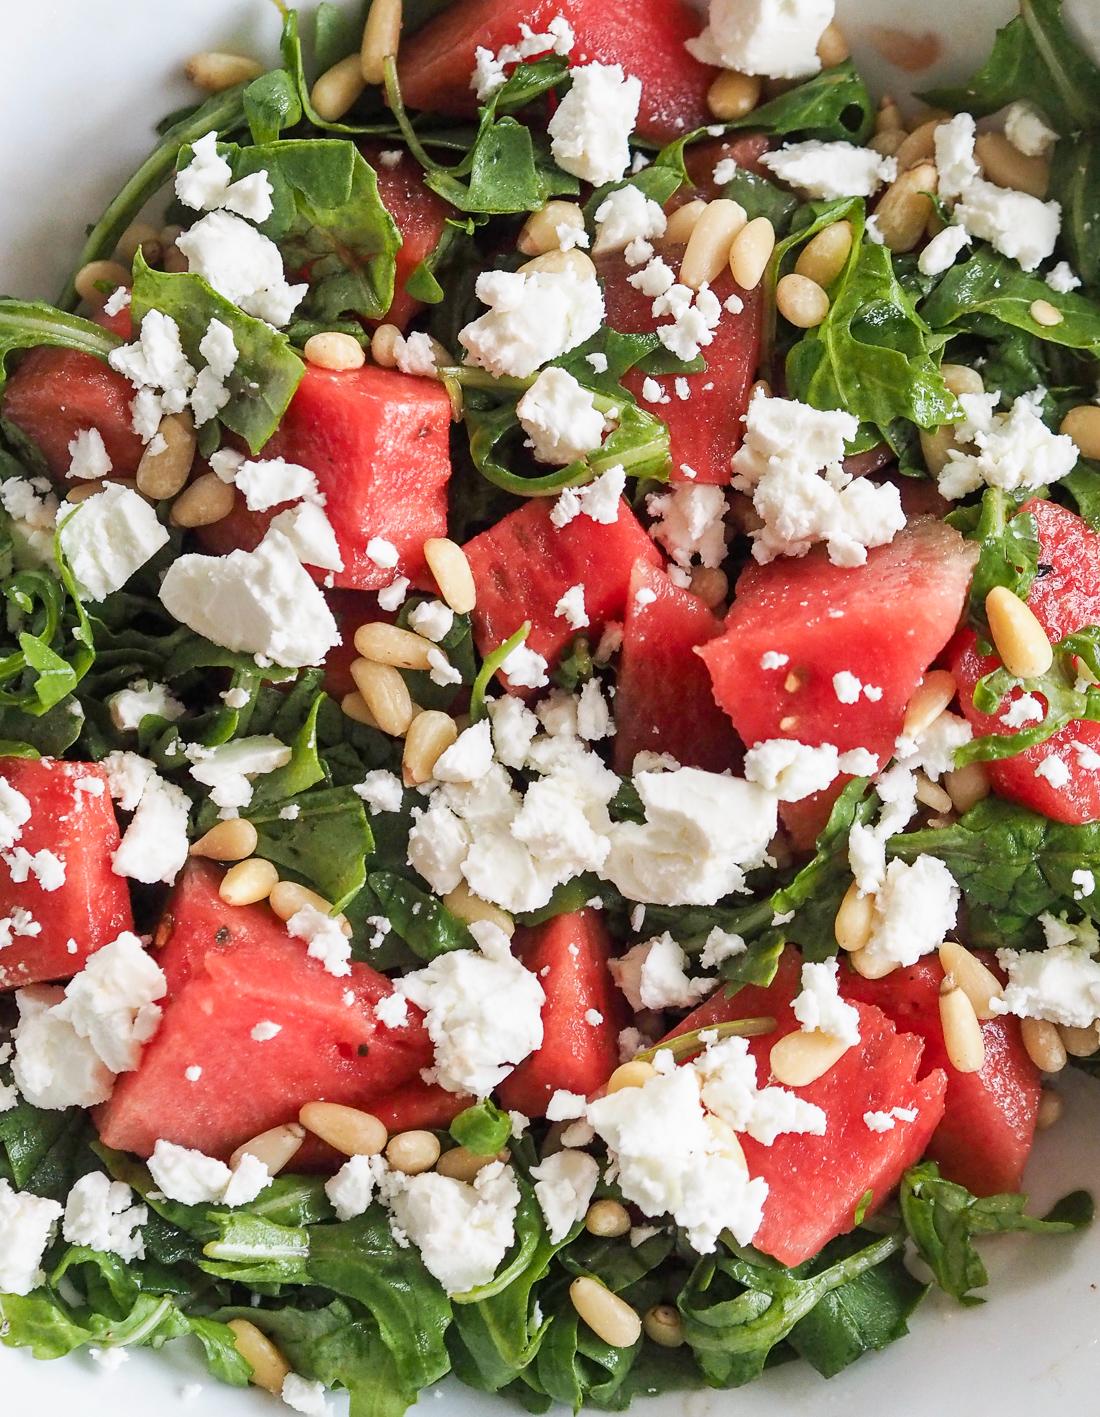 watermelon feta rocket salad with balsamic dressing